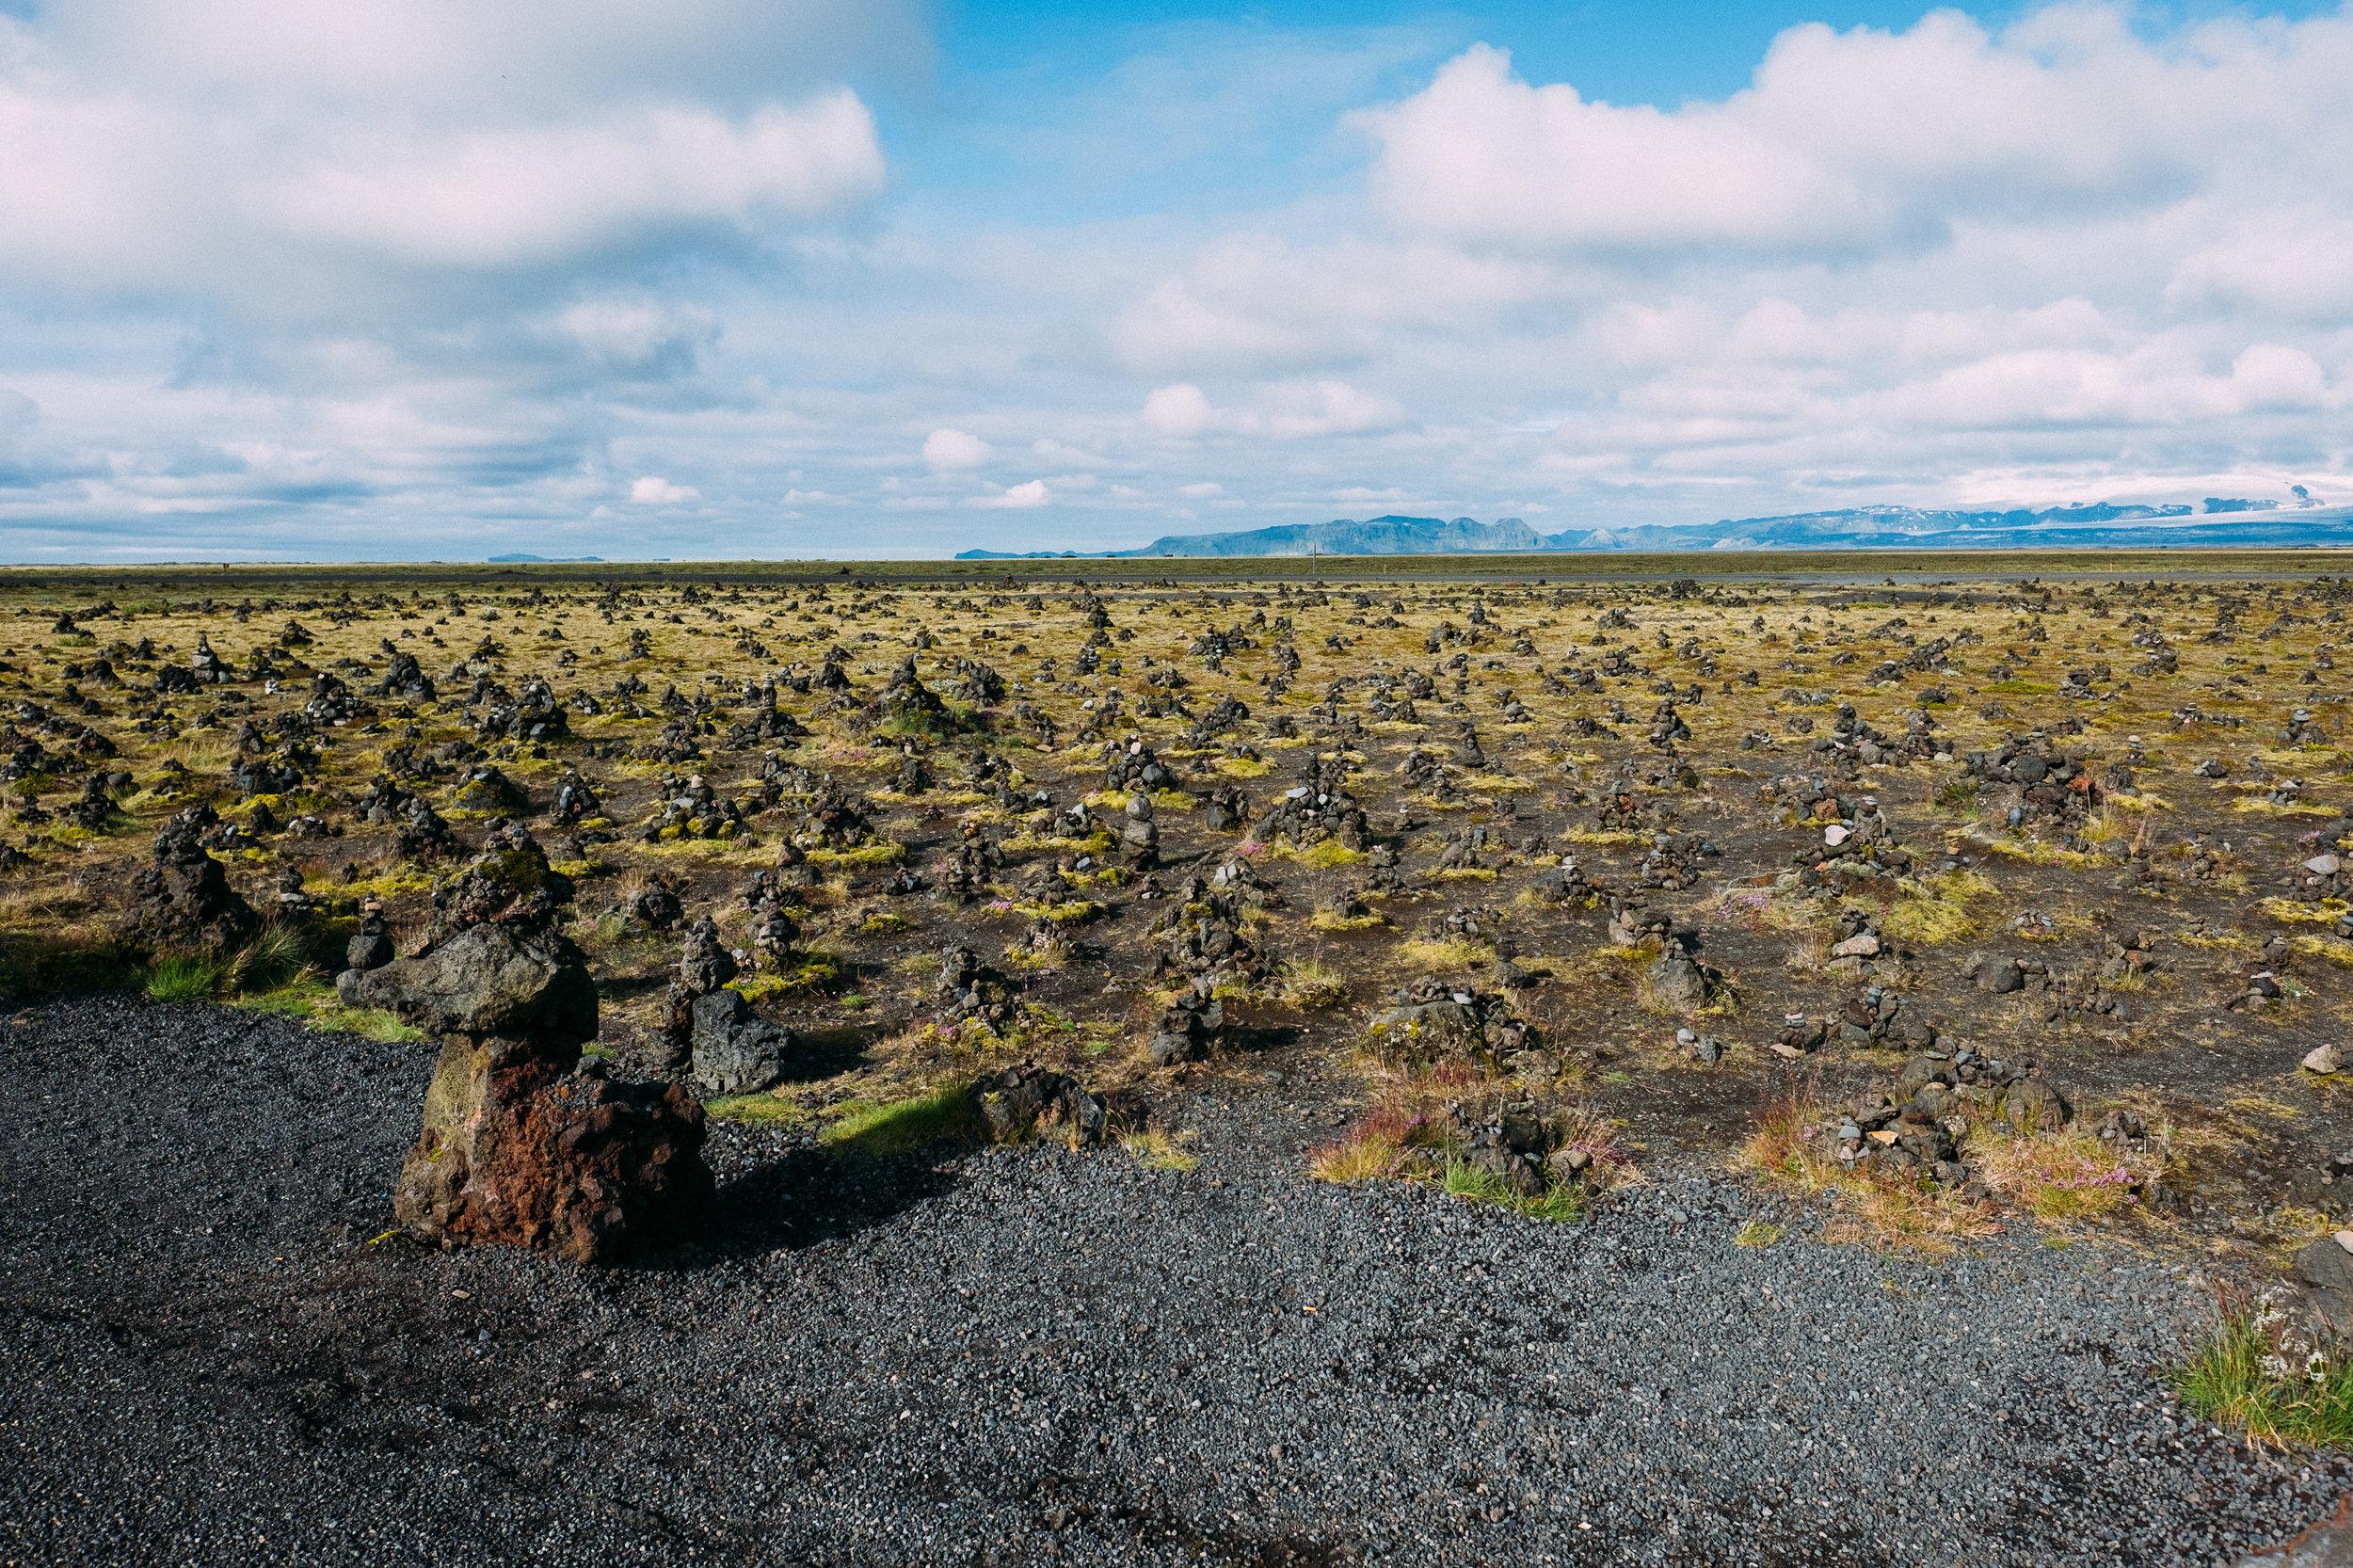 Laufskálavarða -  [63.5052101,-18.7835507]  Fuji X-H1 + 16mm 1.4 lens